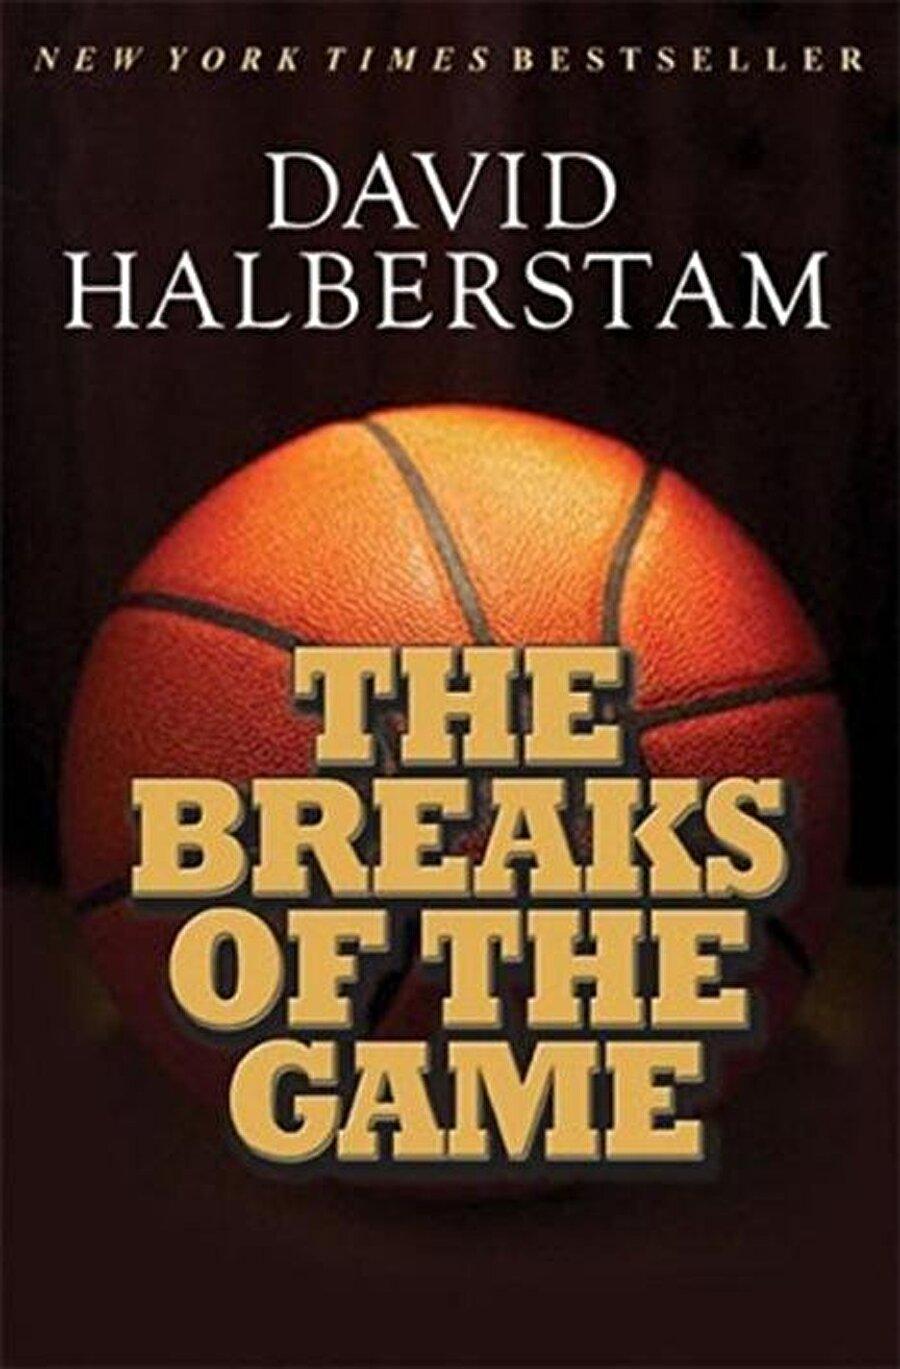 THE BREAKS OF THE GAME: David Halberstam